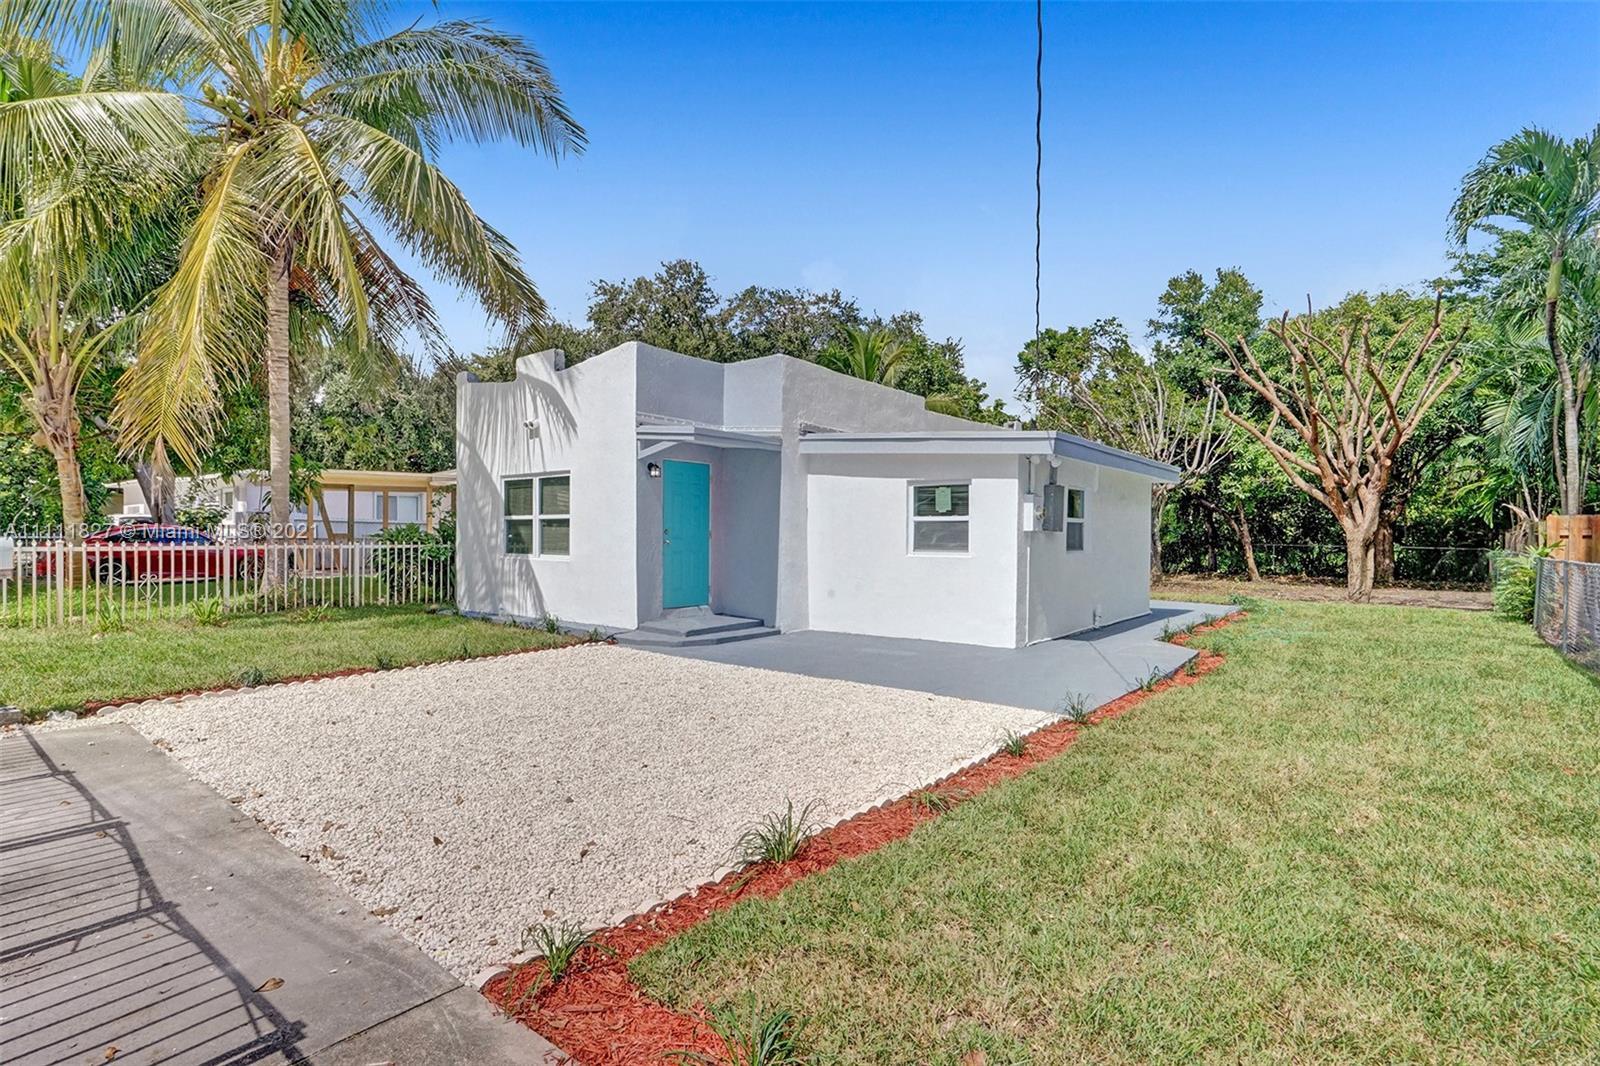 Single Family Home,For Sale,1059 NE 127th St, North Miami, Florida 33161,Brickell,realty,broker,condos near me